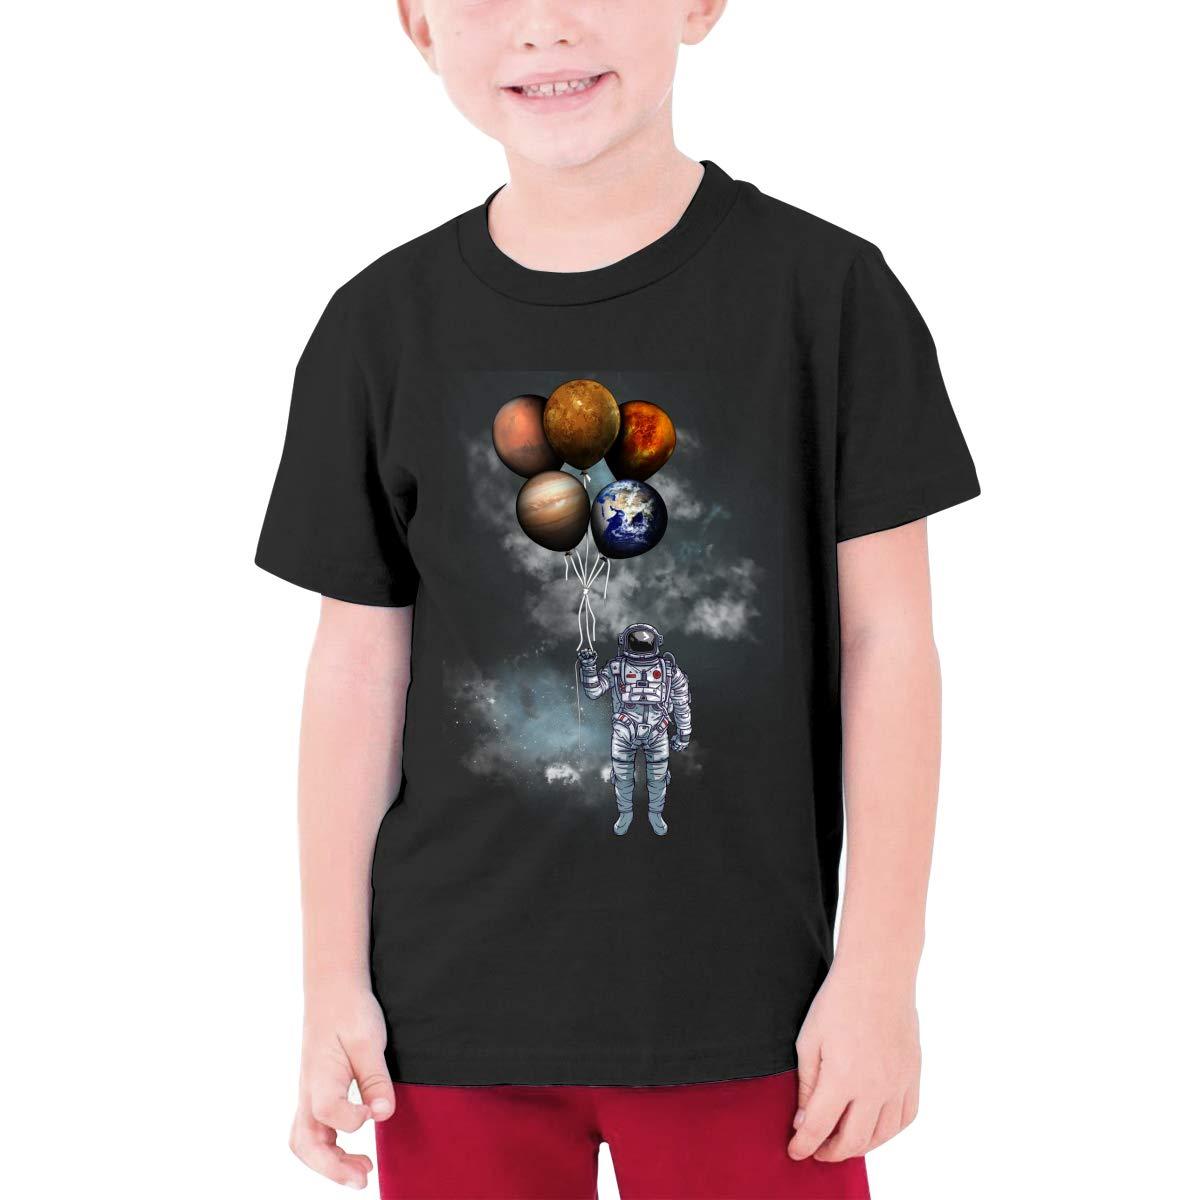 Weibing Boys NASA Starry Night T-Shirts Cotton Short Sleeve Youth Kids Top Tees